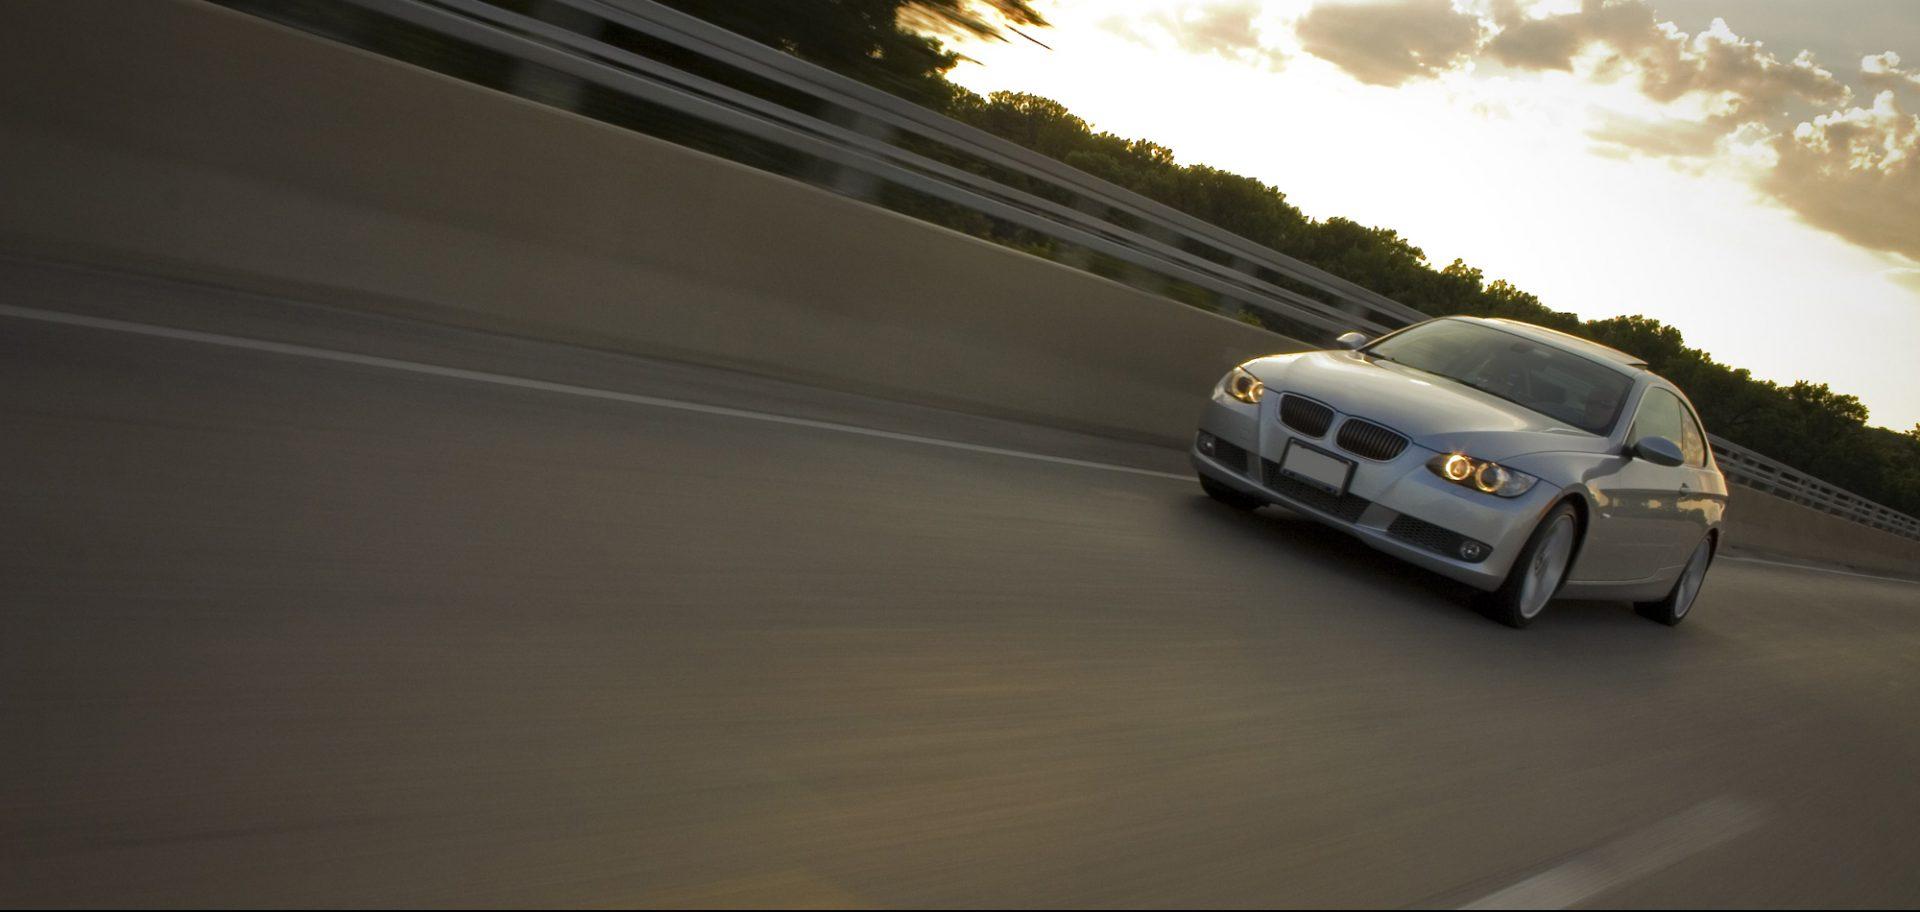 BMW 3 series service